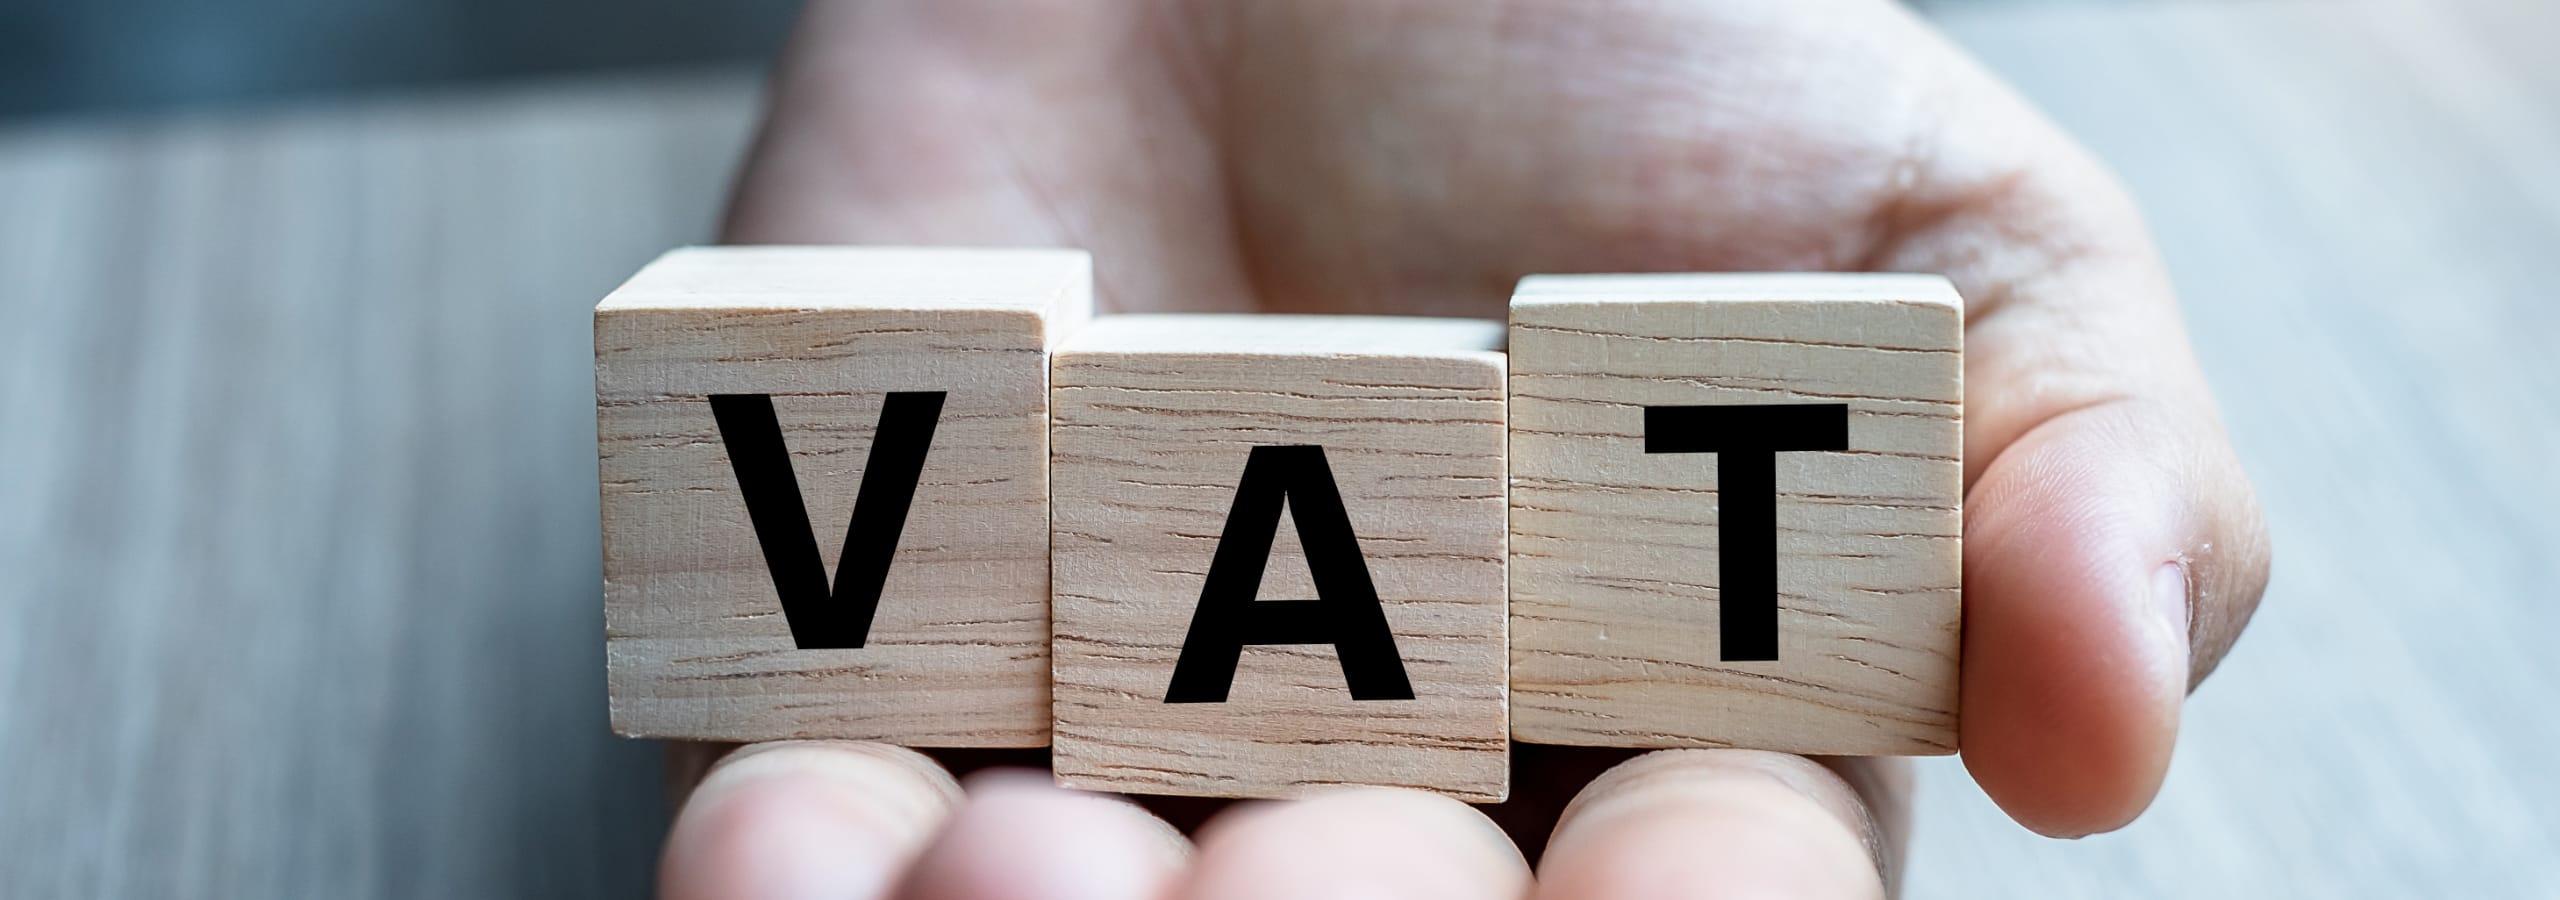 Podatek VAT na rok 2020